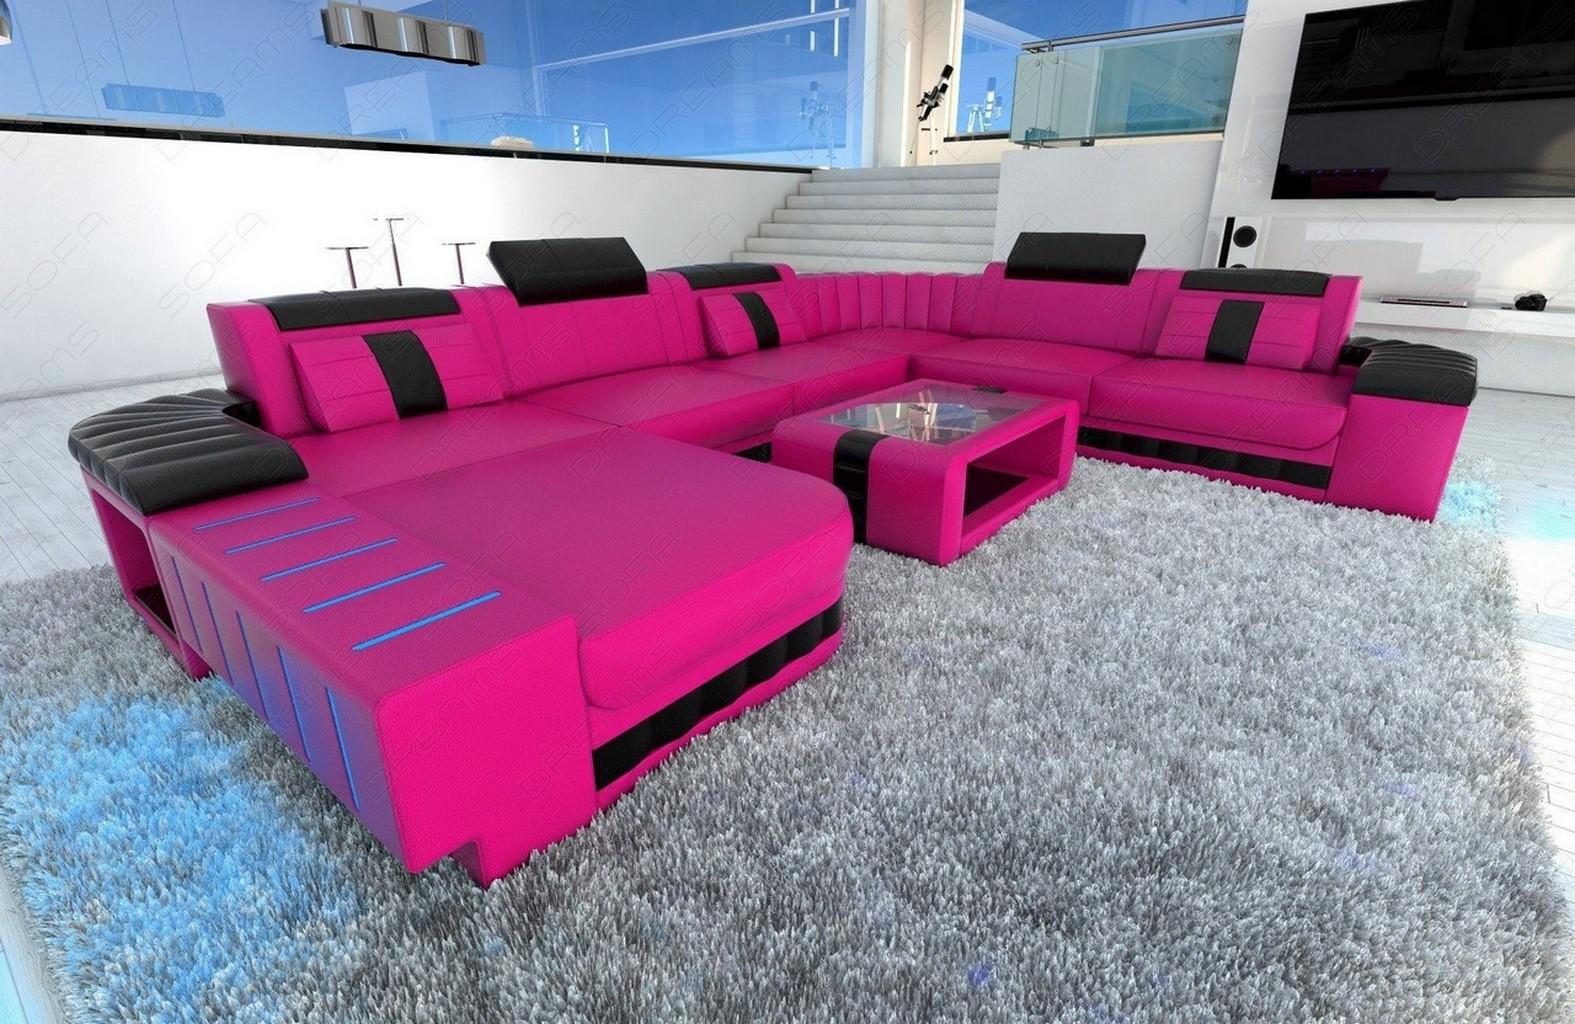 xxl sectional sofa bellagio led u shaped pink black ebay. Black Bedroom Furniture Sets. Home Design Ideas